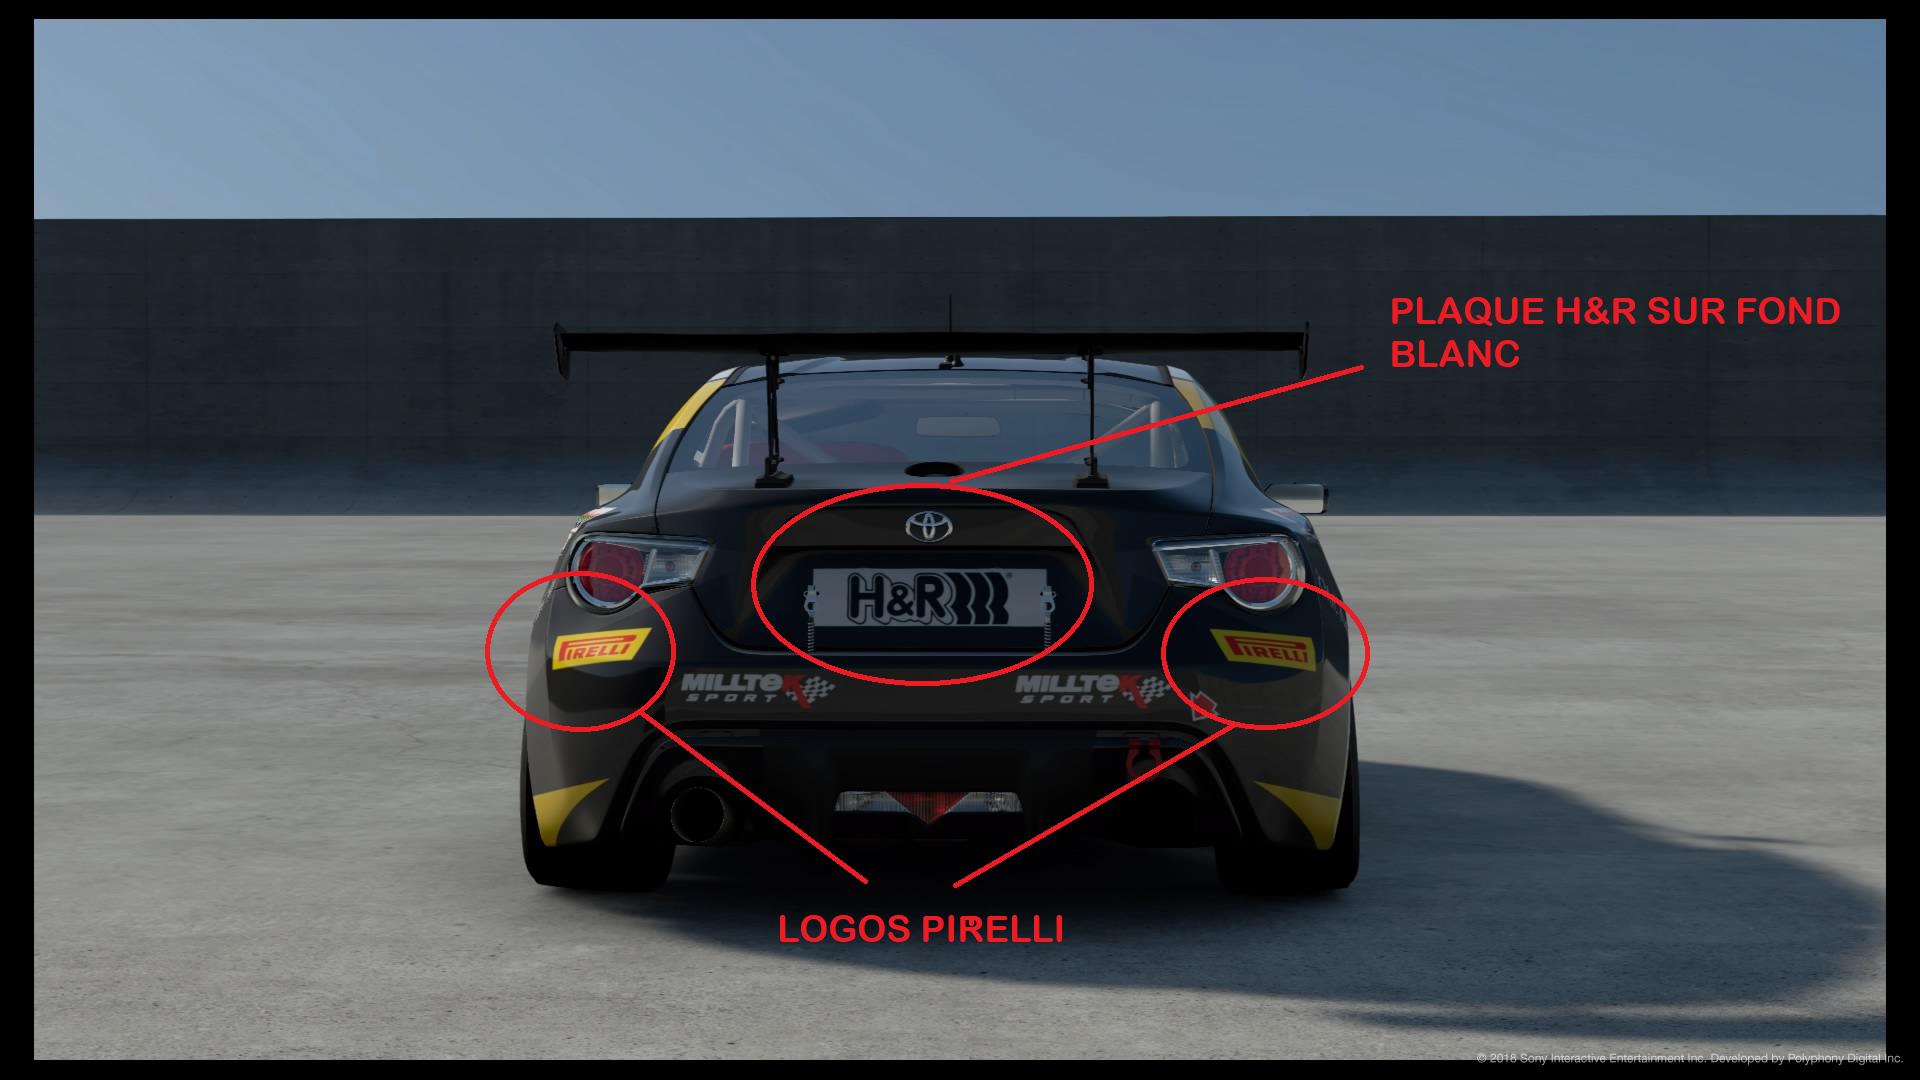 181203012841758971 ForzaMotorsport.fr